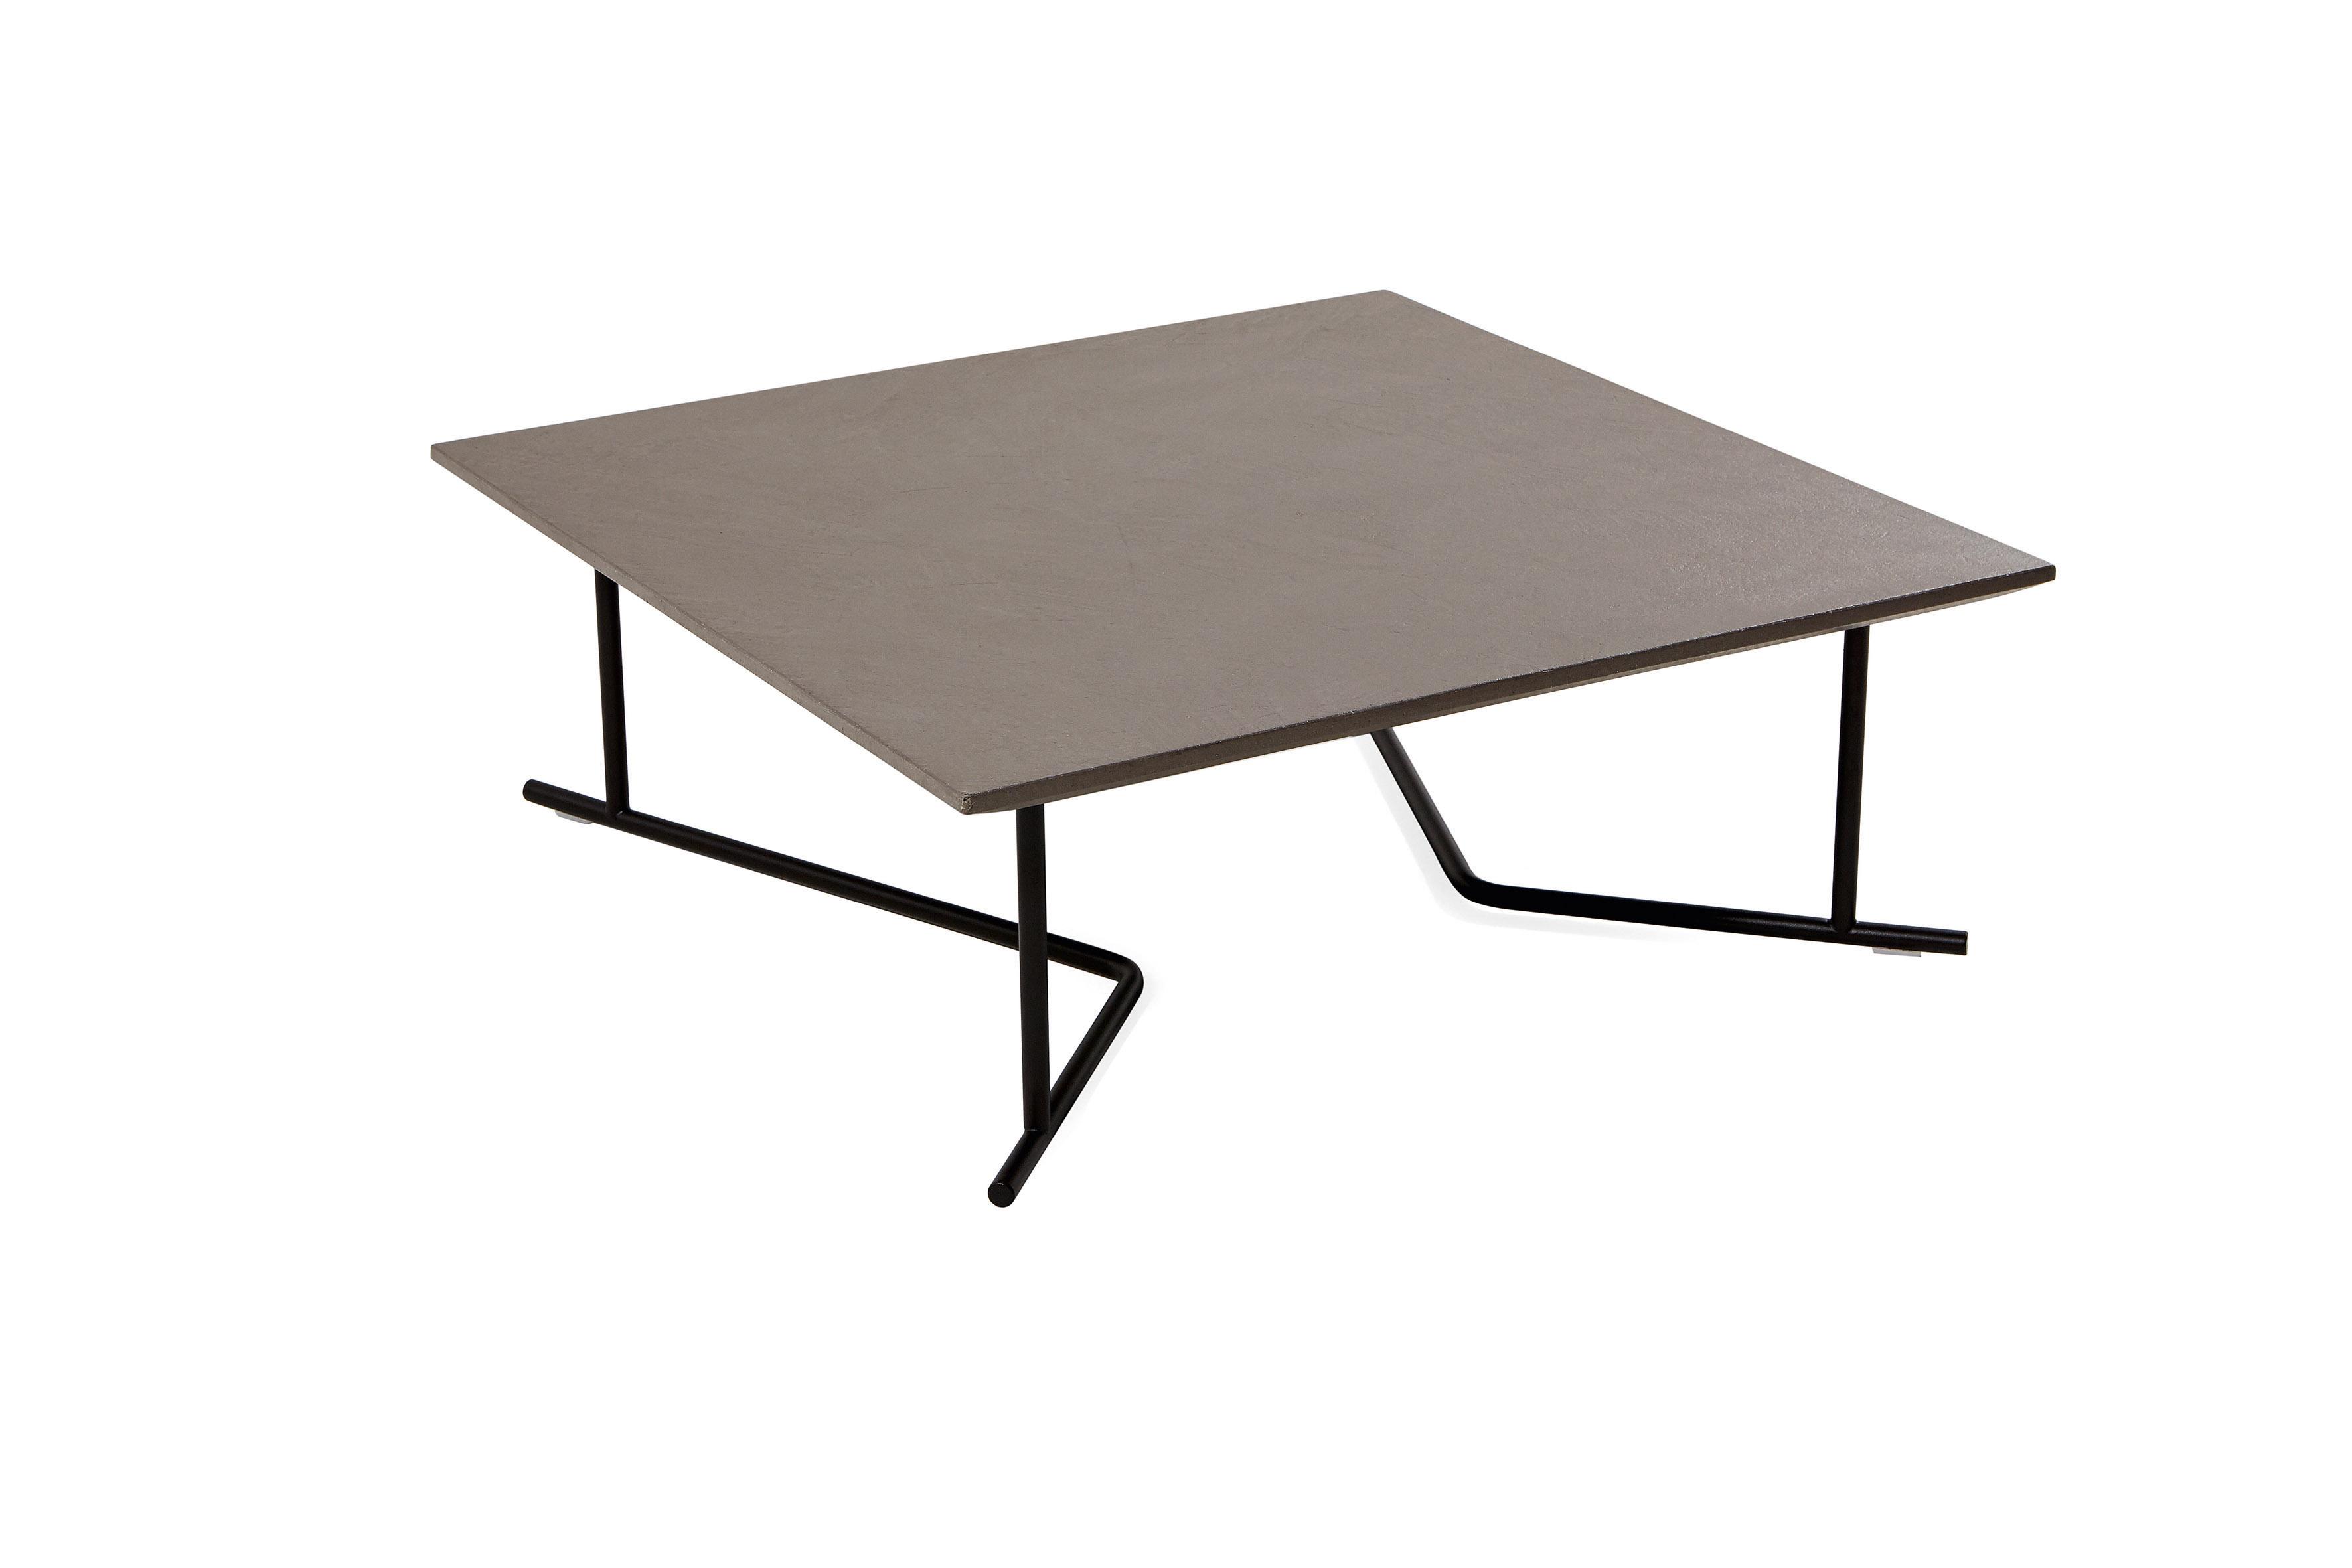 IL Decor Furniture Colorado Coffee Table Varaschin Italy